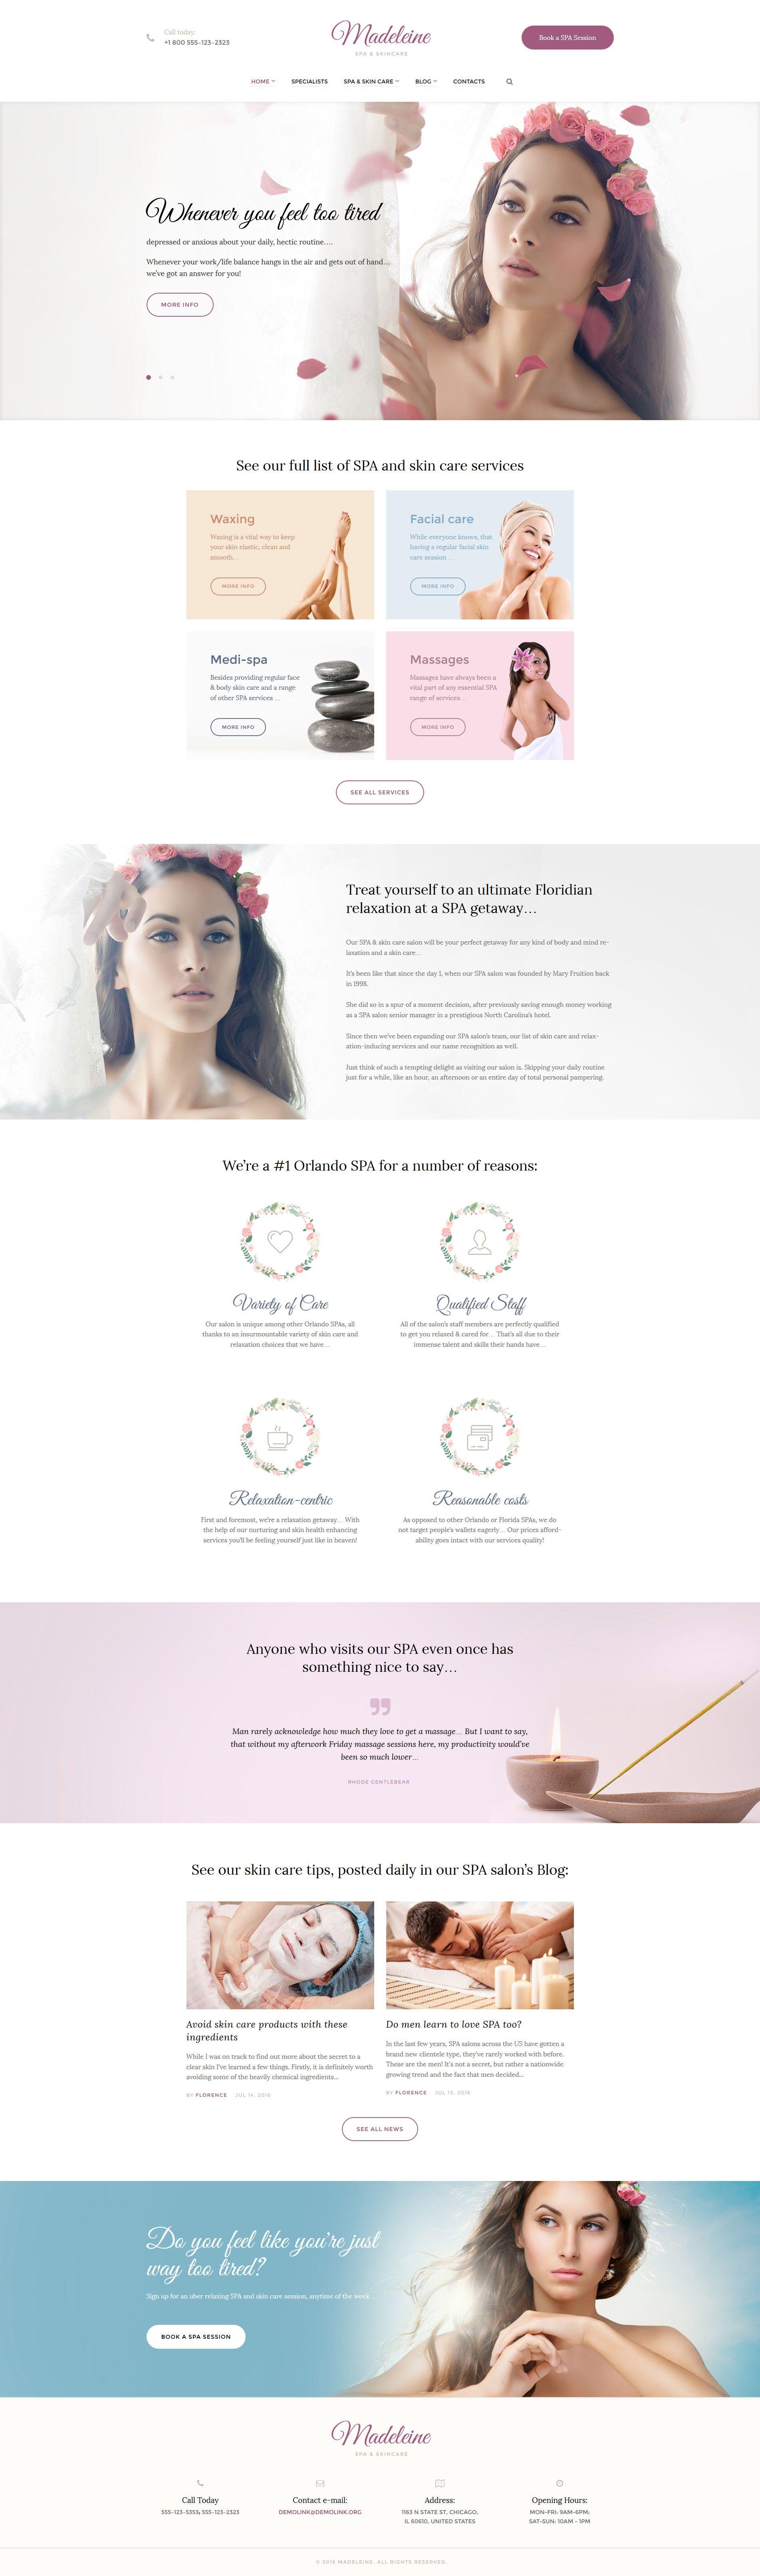 Madeleine Spa Skincare WordPress Theme http://www.templatemonster.com/wordpress-themes/beauty-salon-responsive-wordpress-theme-59014.html